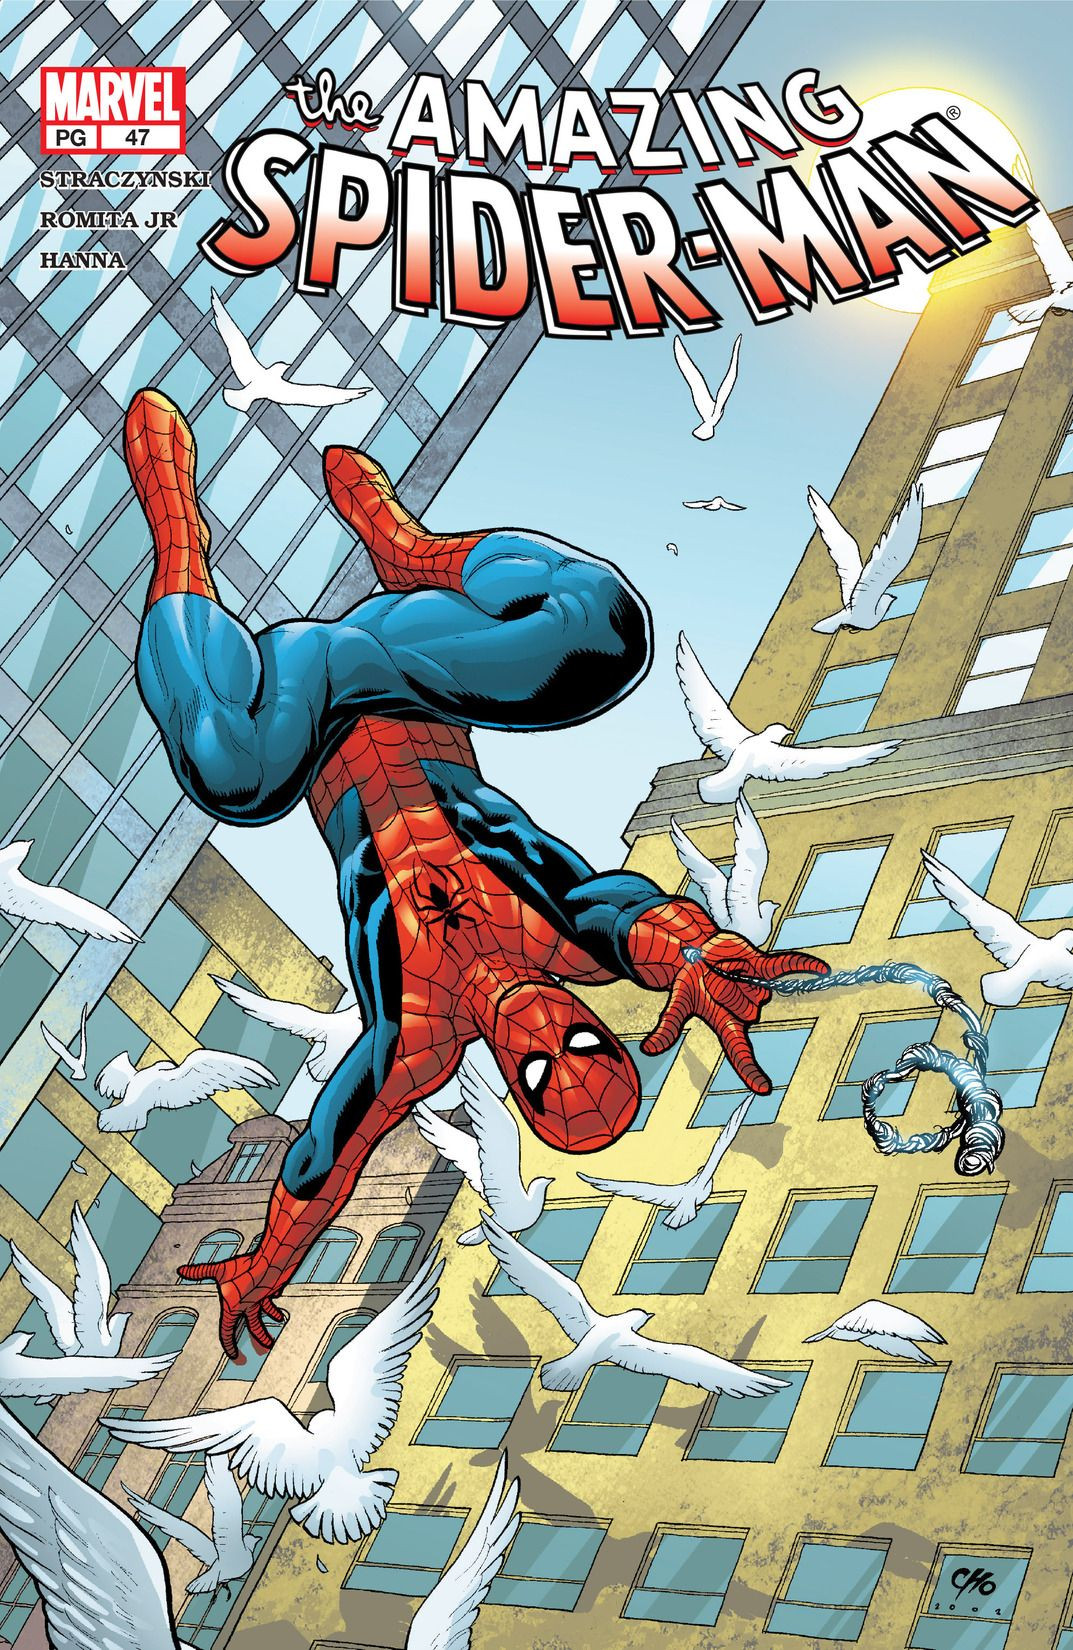 Amazing spider man vol 2 - Marvel spiderman comics pdf ...